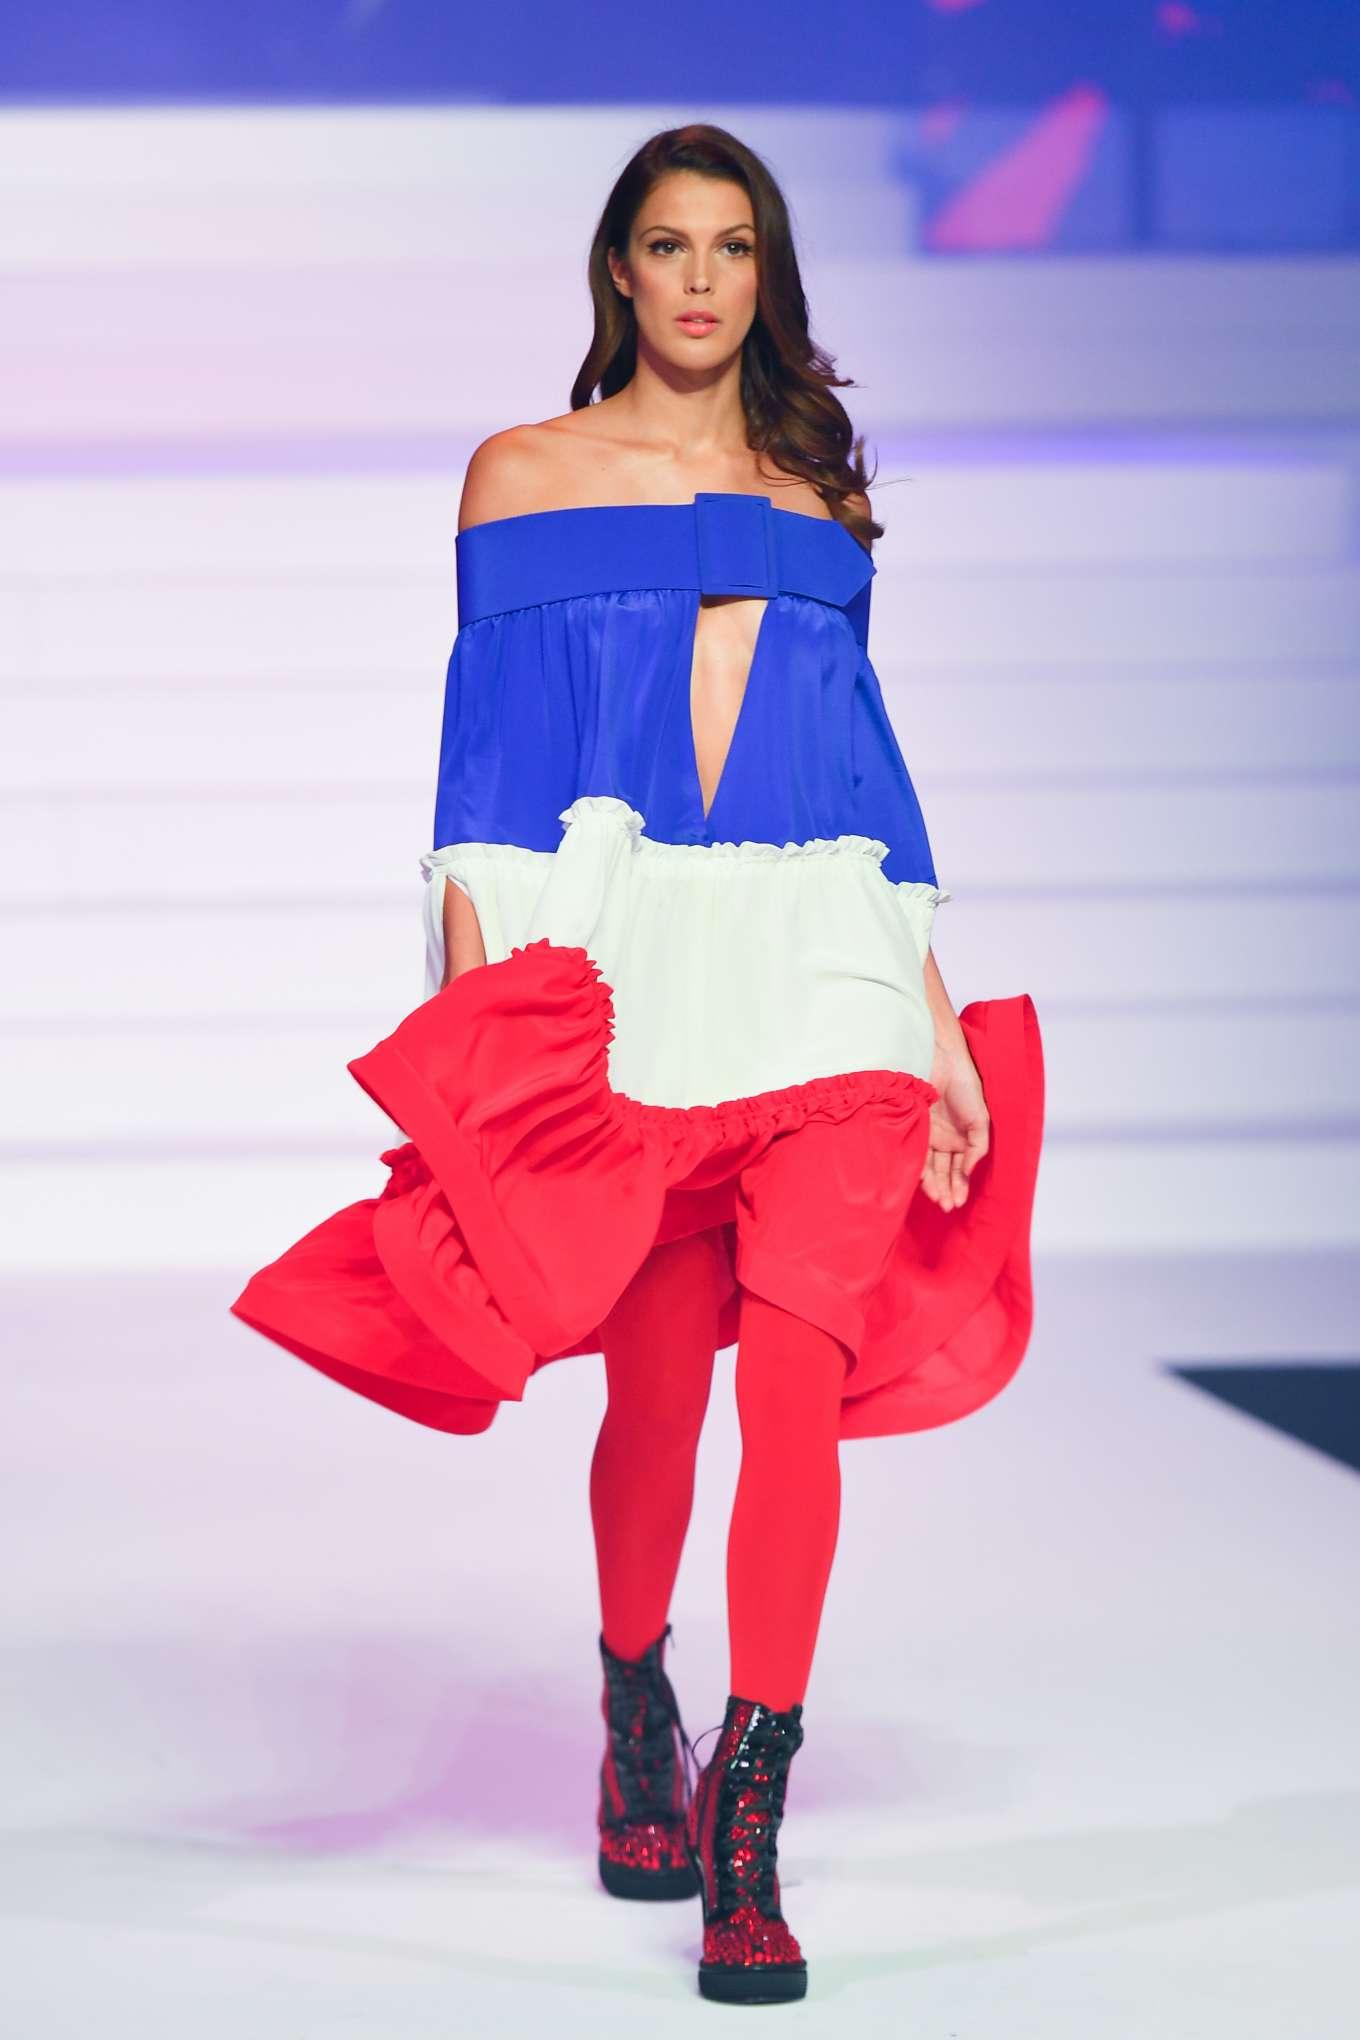 Iris Mittenaere 2020 : Iris Mittenaere – Jean-Paul Gaultier Runway Show in Paris-10